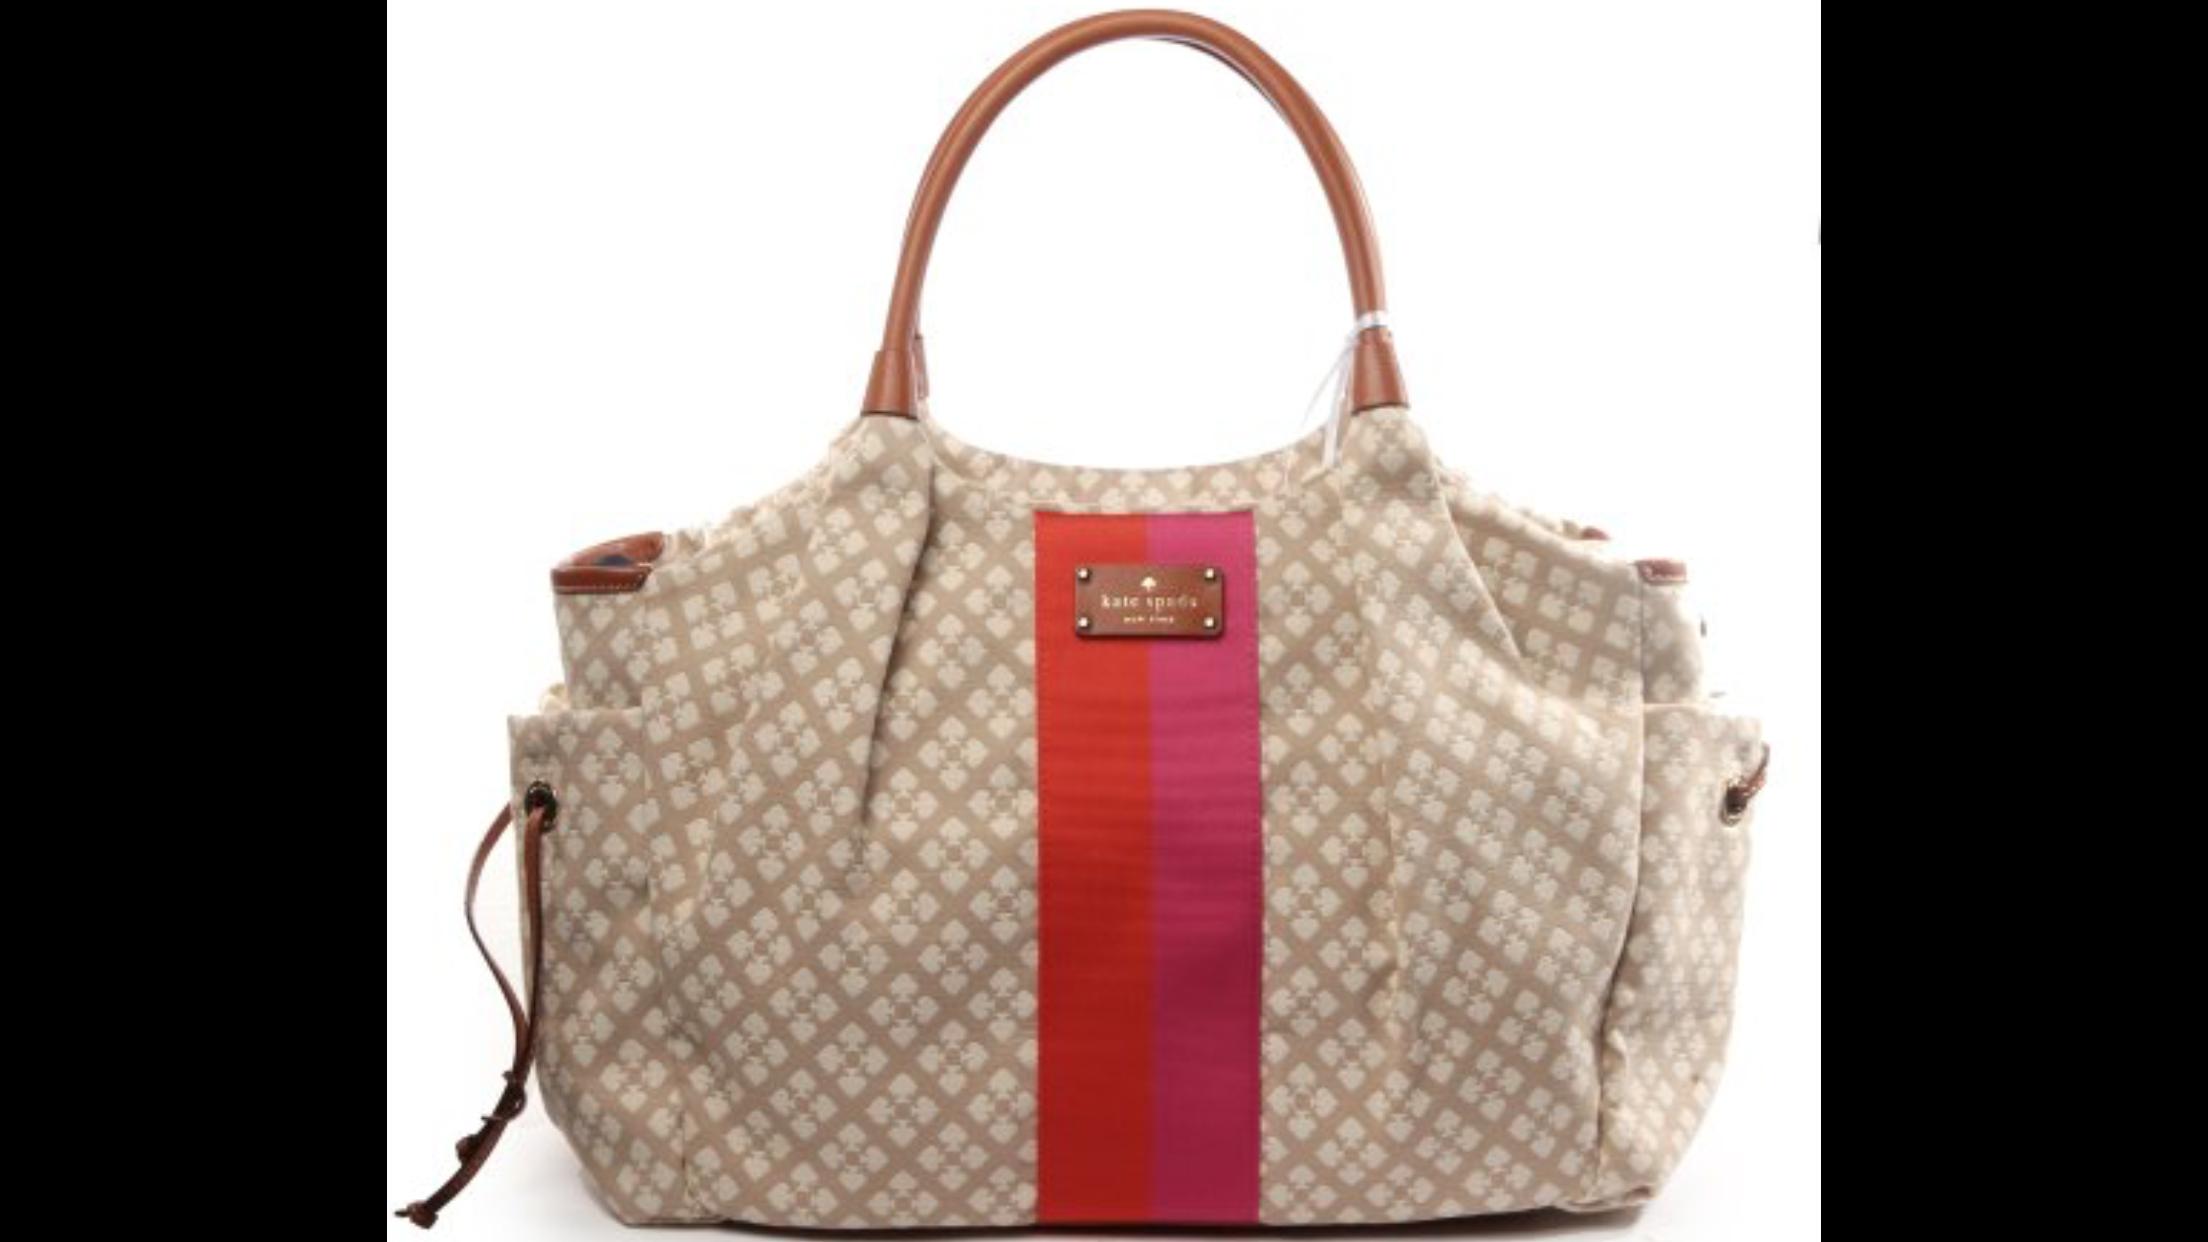 Kate Spade Stevie Bag Classic Stucco Beige 350 Bags I